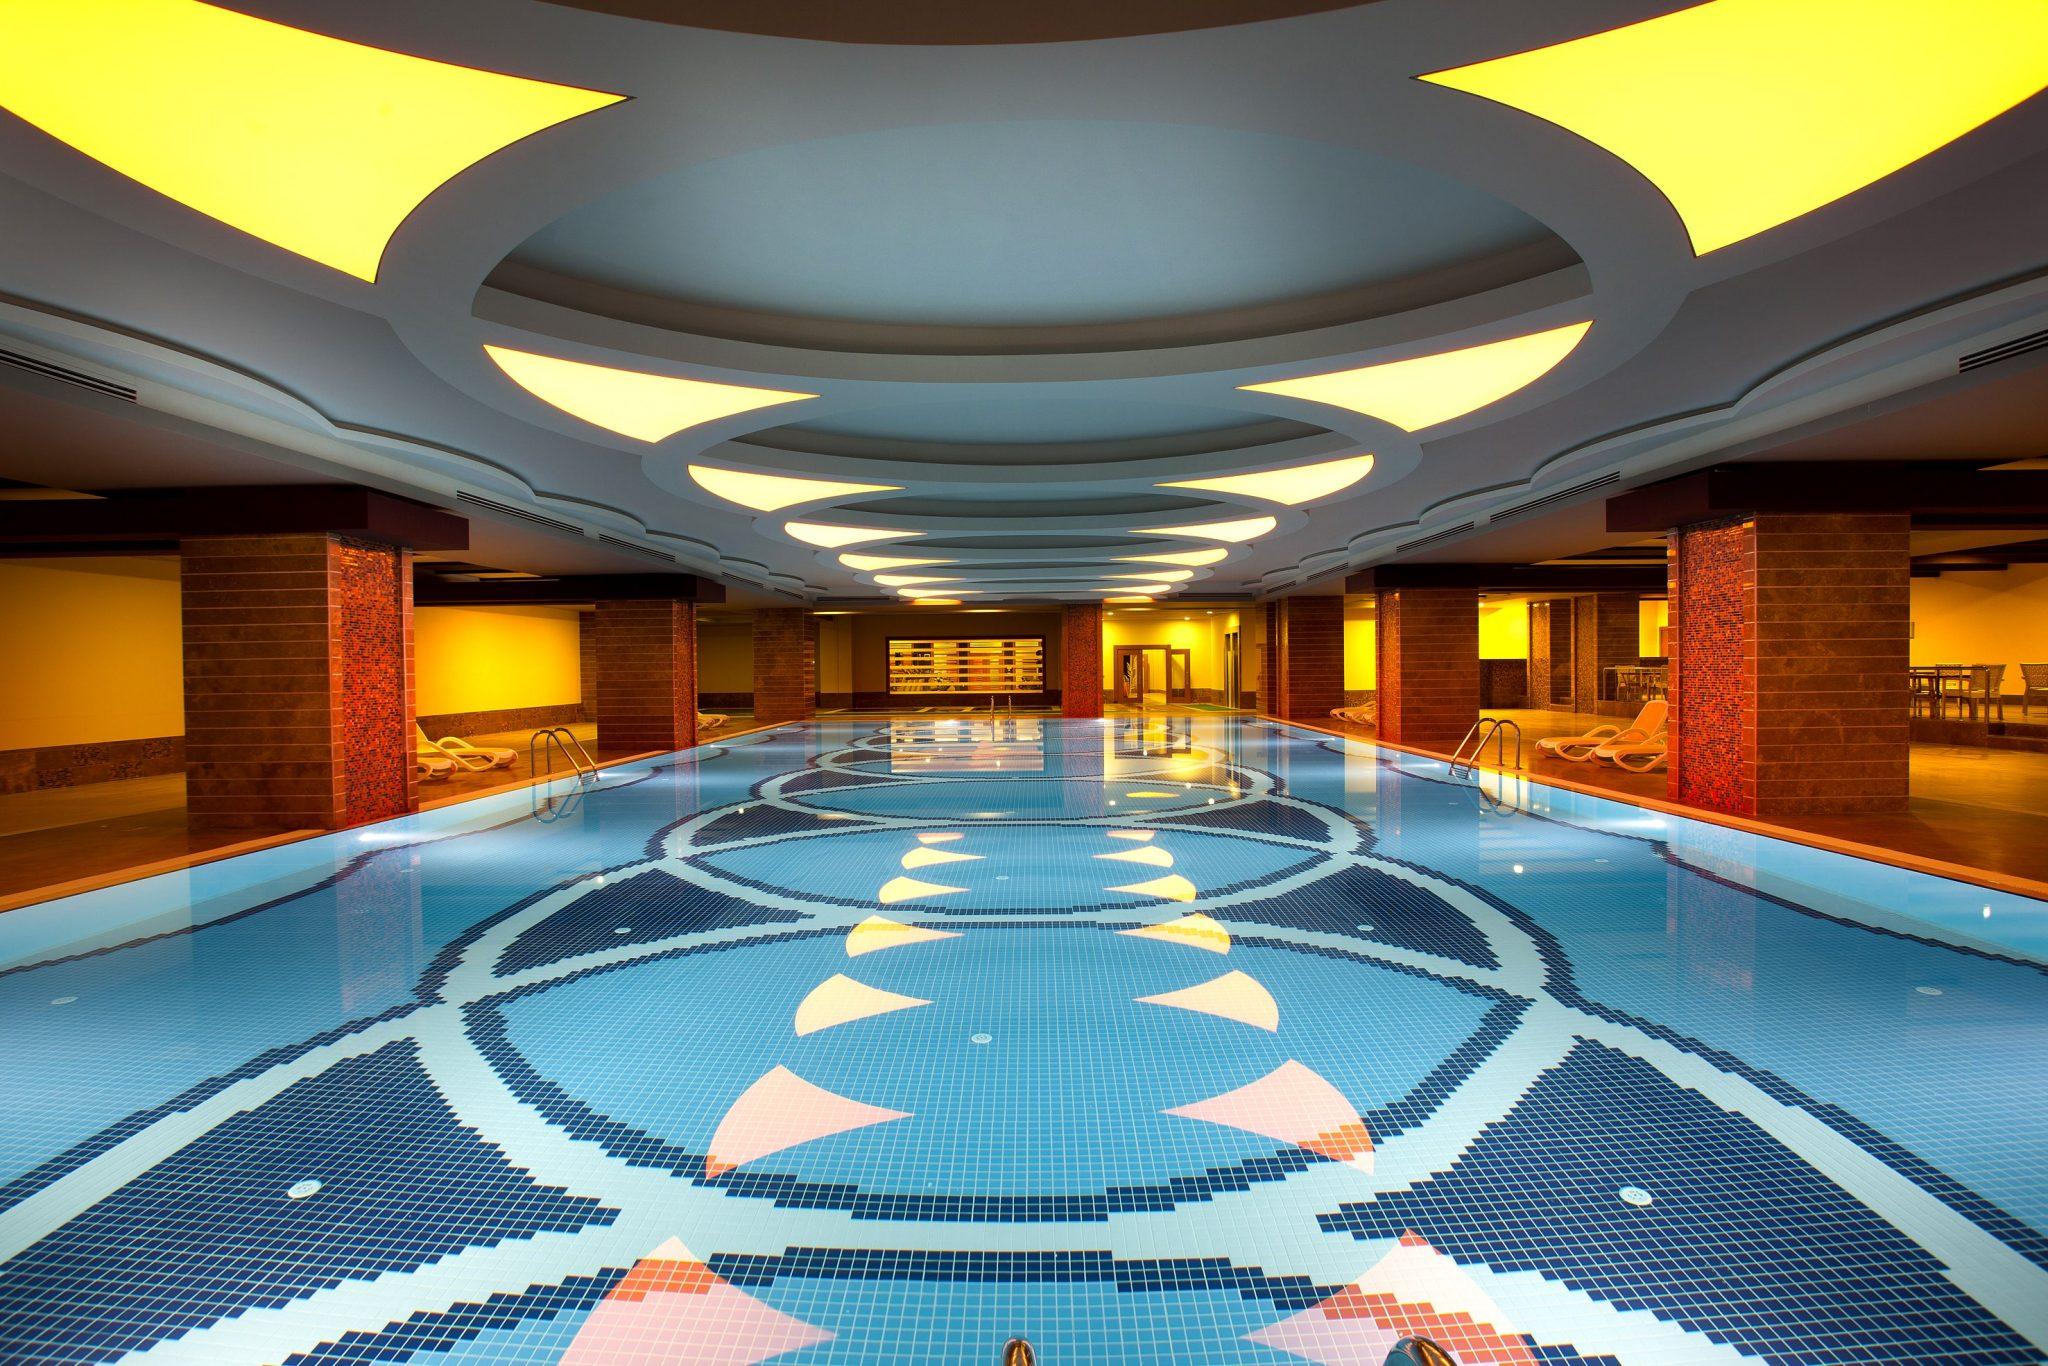 Letovanje_Turska_Hoteli_Avio_Antalija_Hotel_Royal_Holiday_Palace-30-scaled.jpg